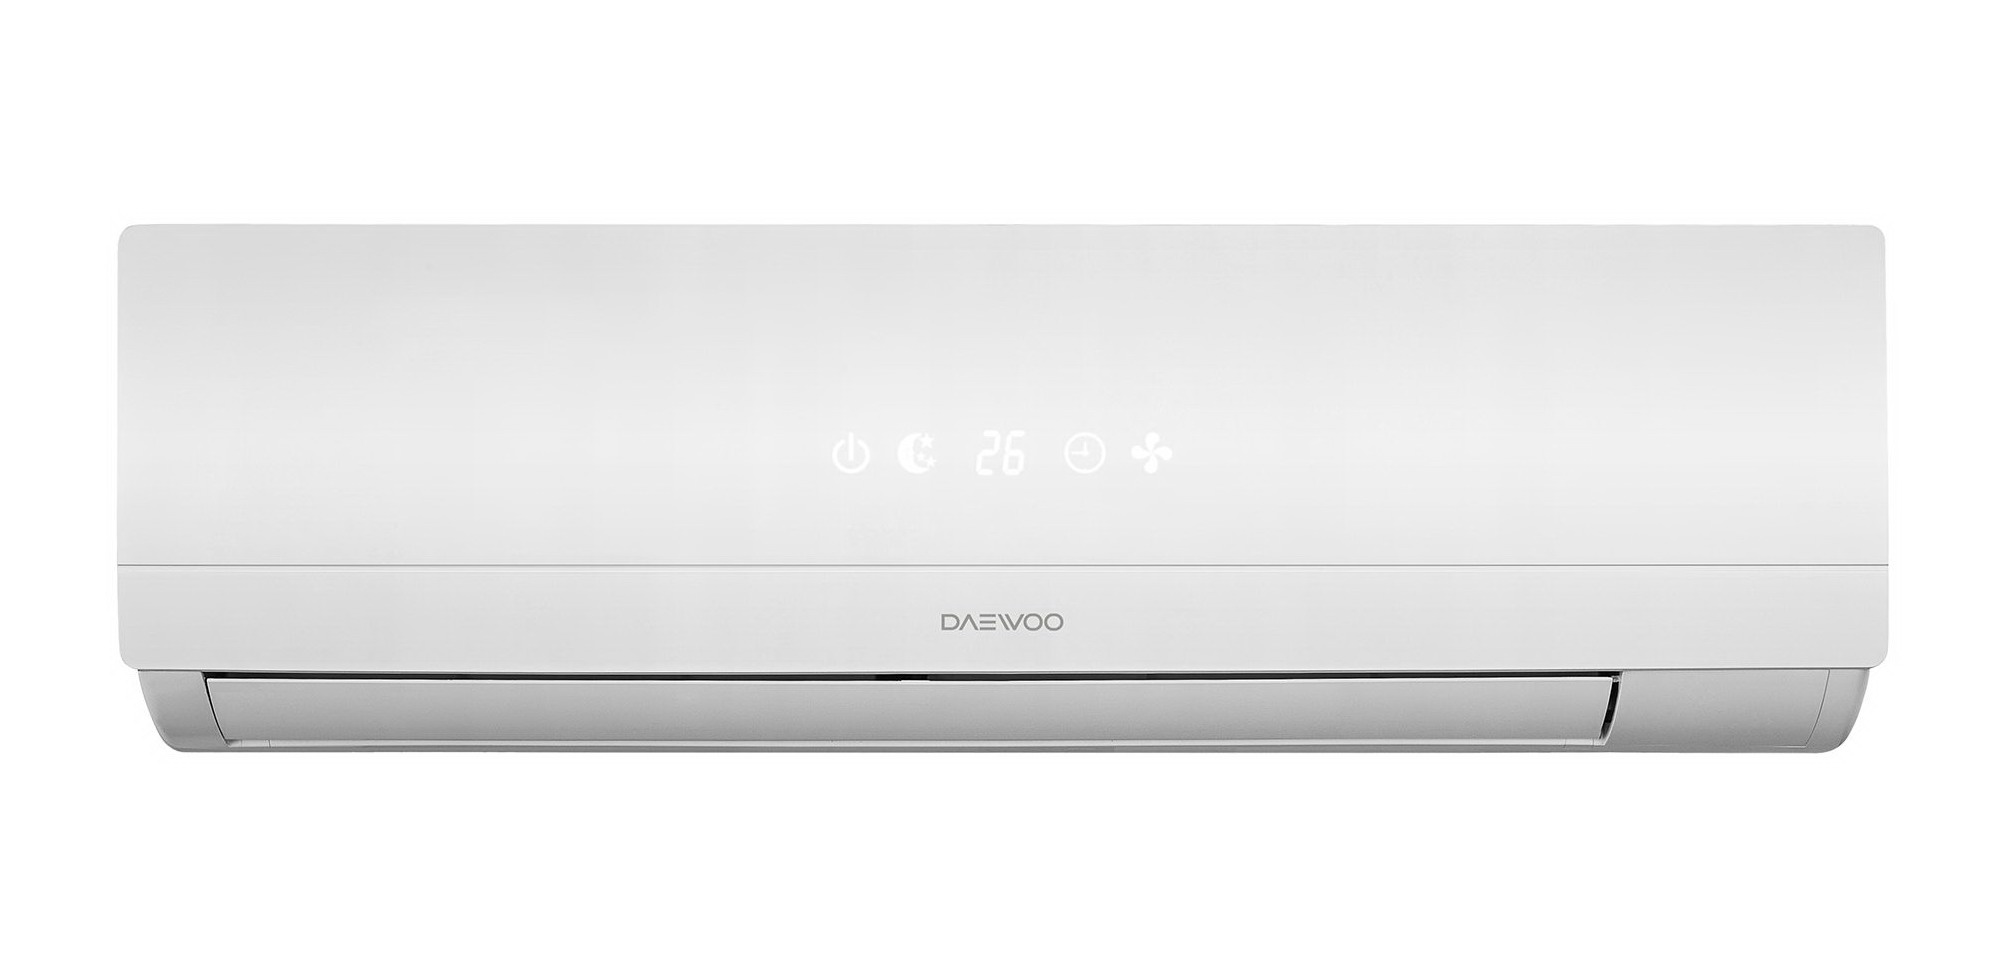 Daewoo DSB-F1234ELH-V